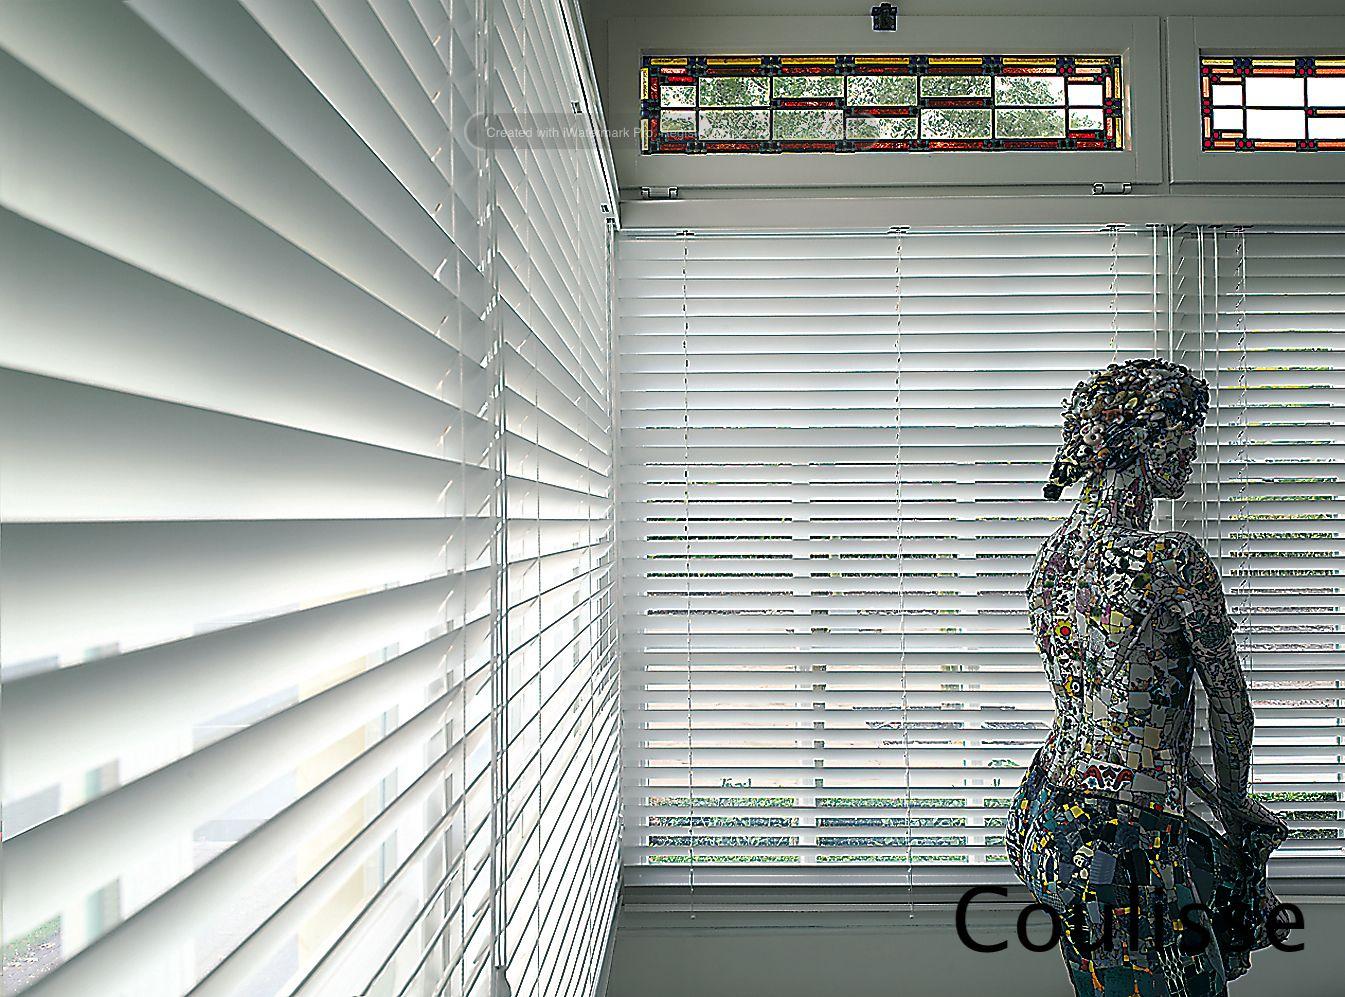 Aluminum slats for 25mm venetian shutters buy aluminium - Coulisse Usa Venetian Blinds